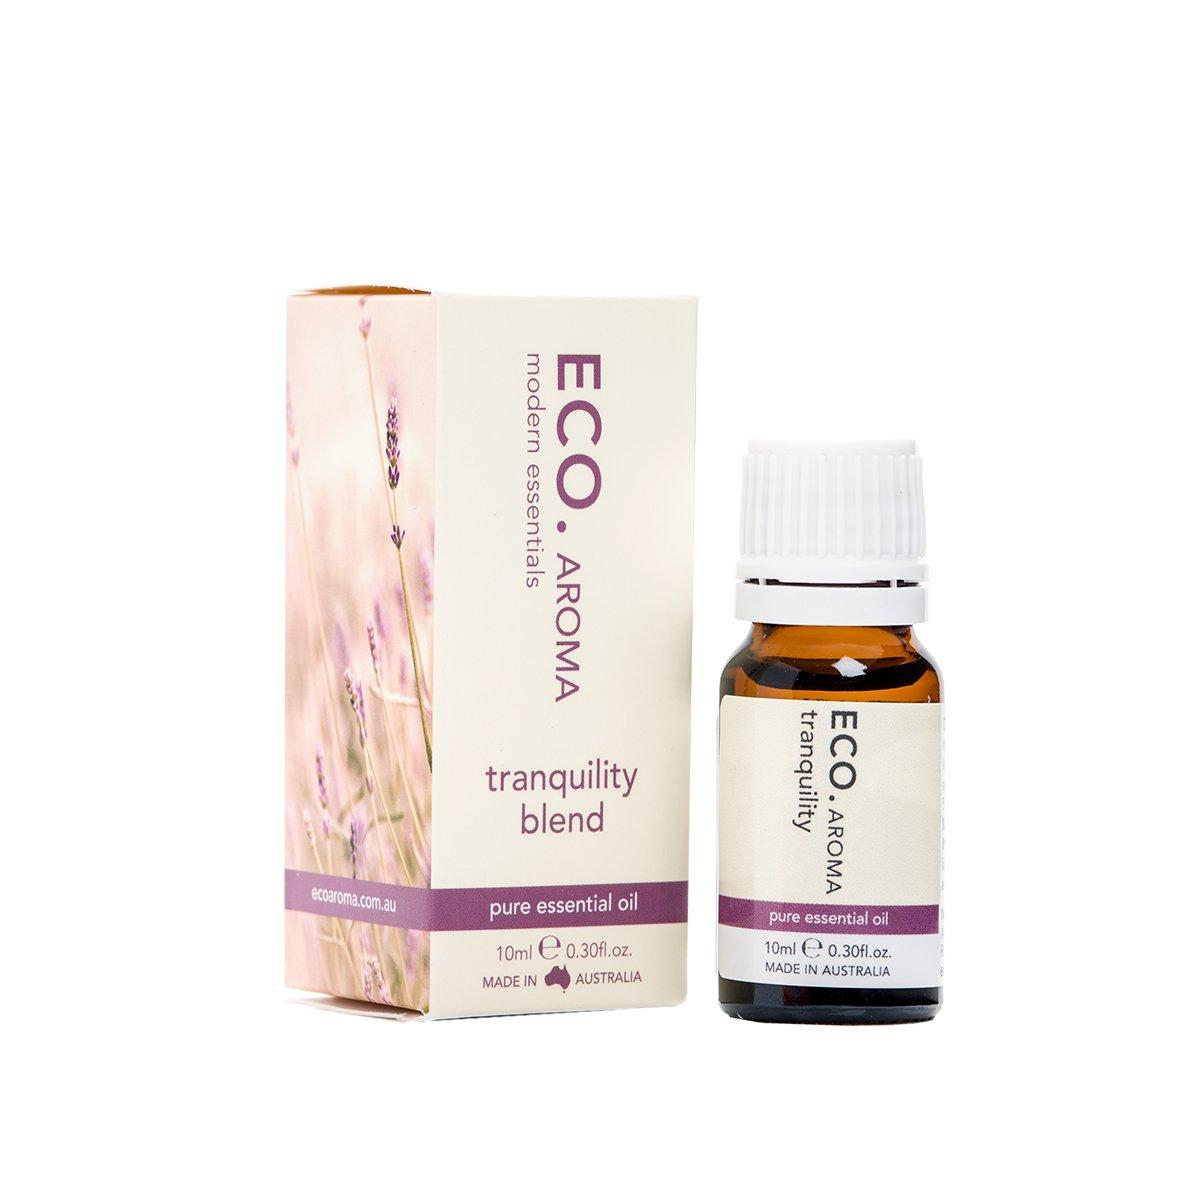 Eco Modern Essentials Oils 10ml - Tranquility